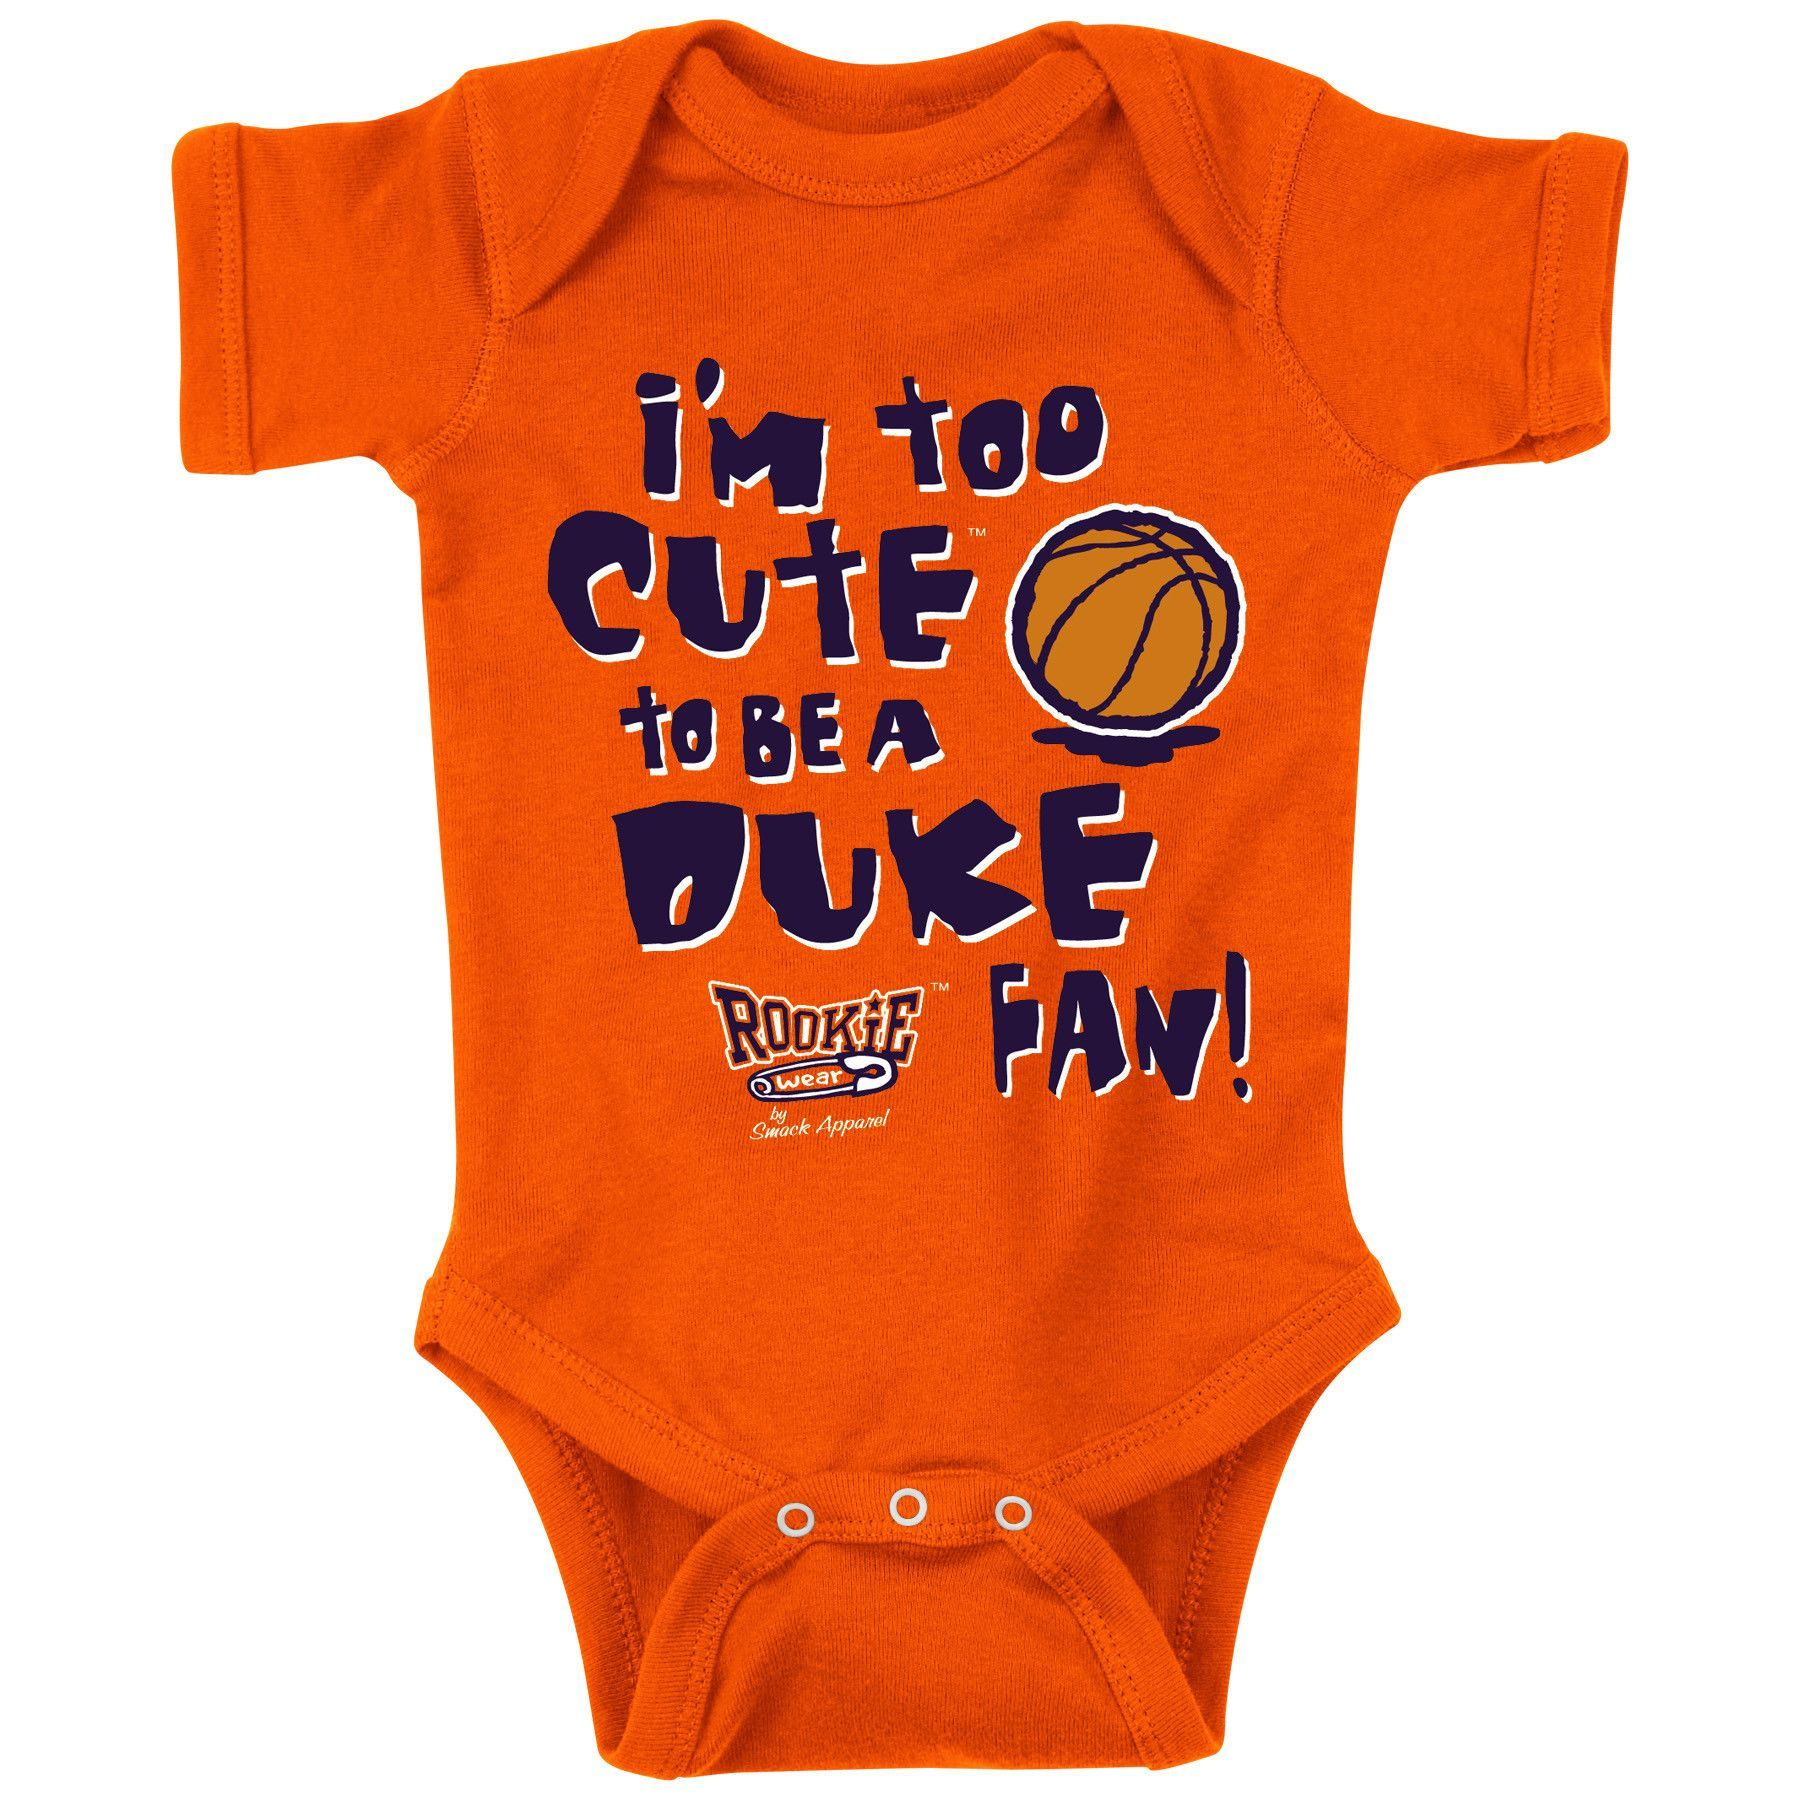 Syracuse Orange Fans Too Cute Anti Duke esie NB 18M